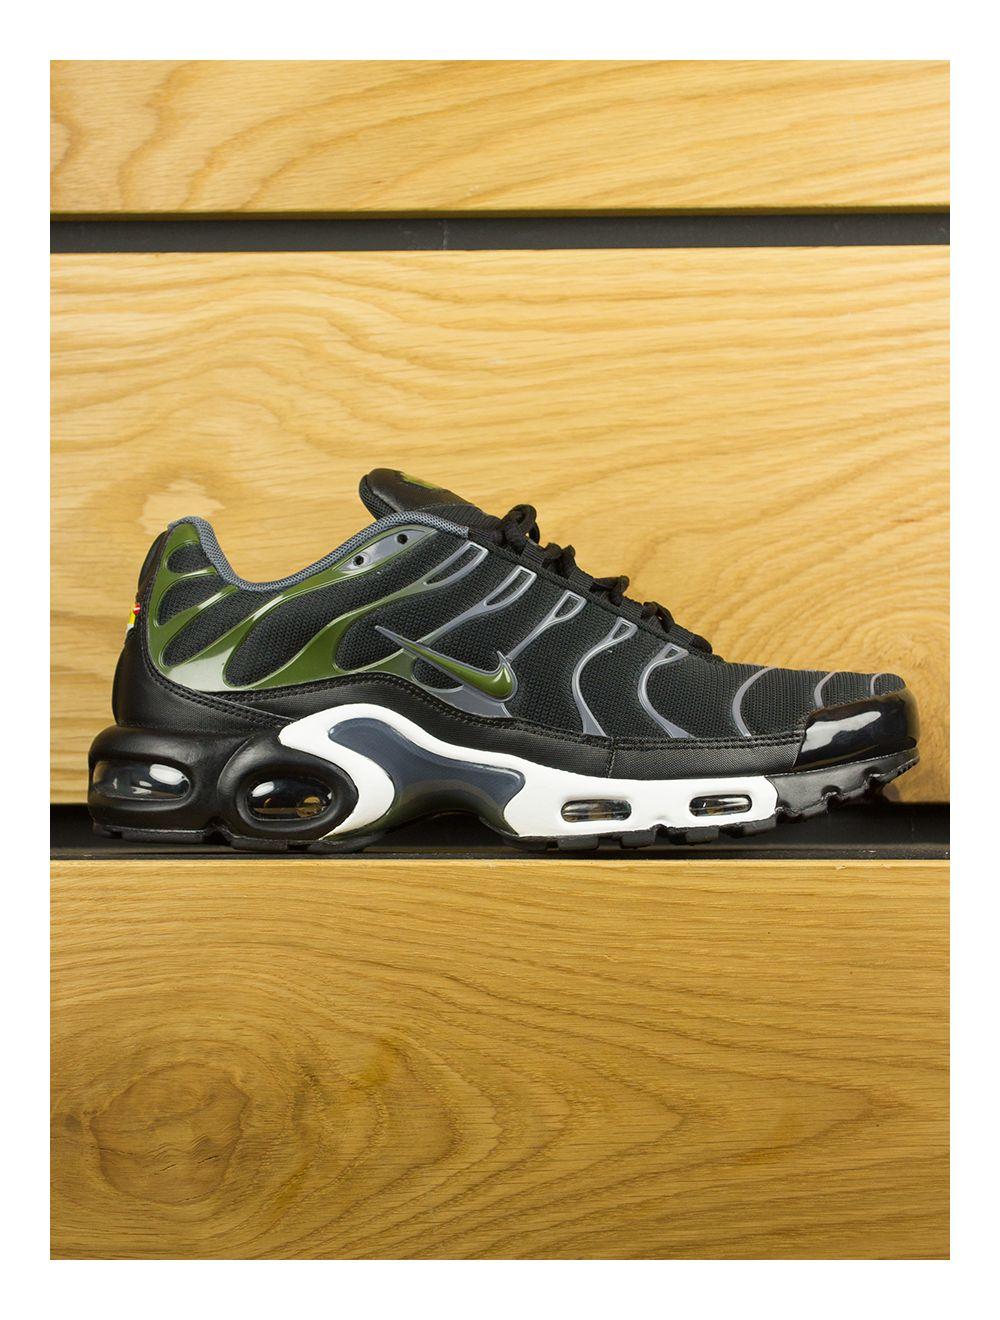 factory price d554f dad1a Nike Air Max Plus (TN) Black Legion Green